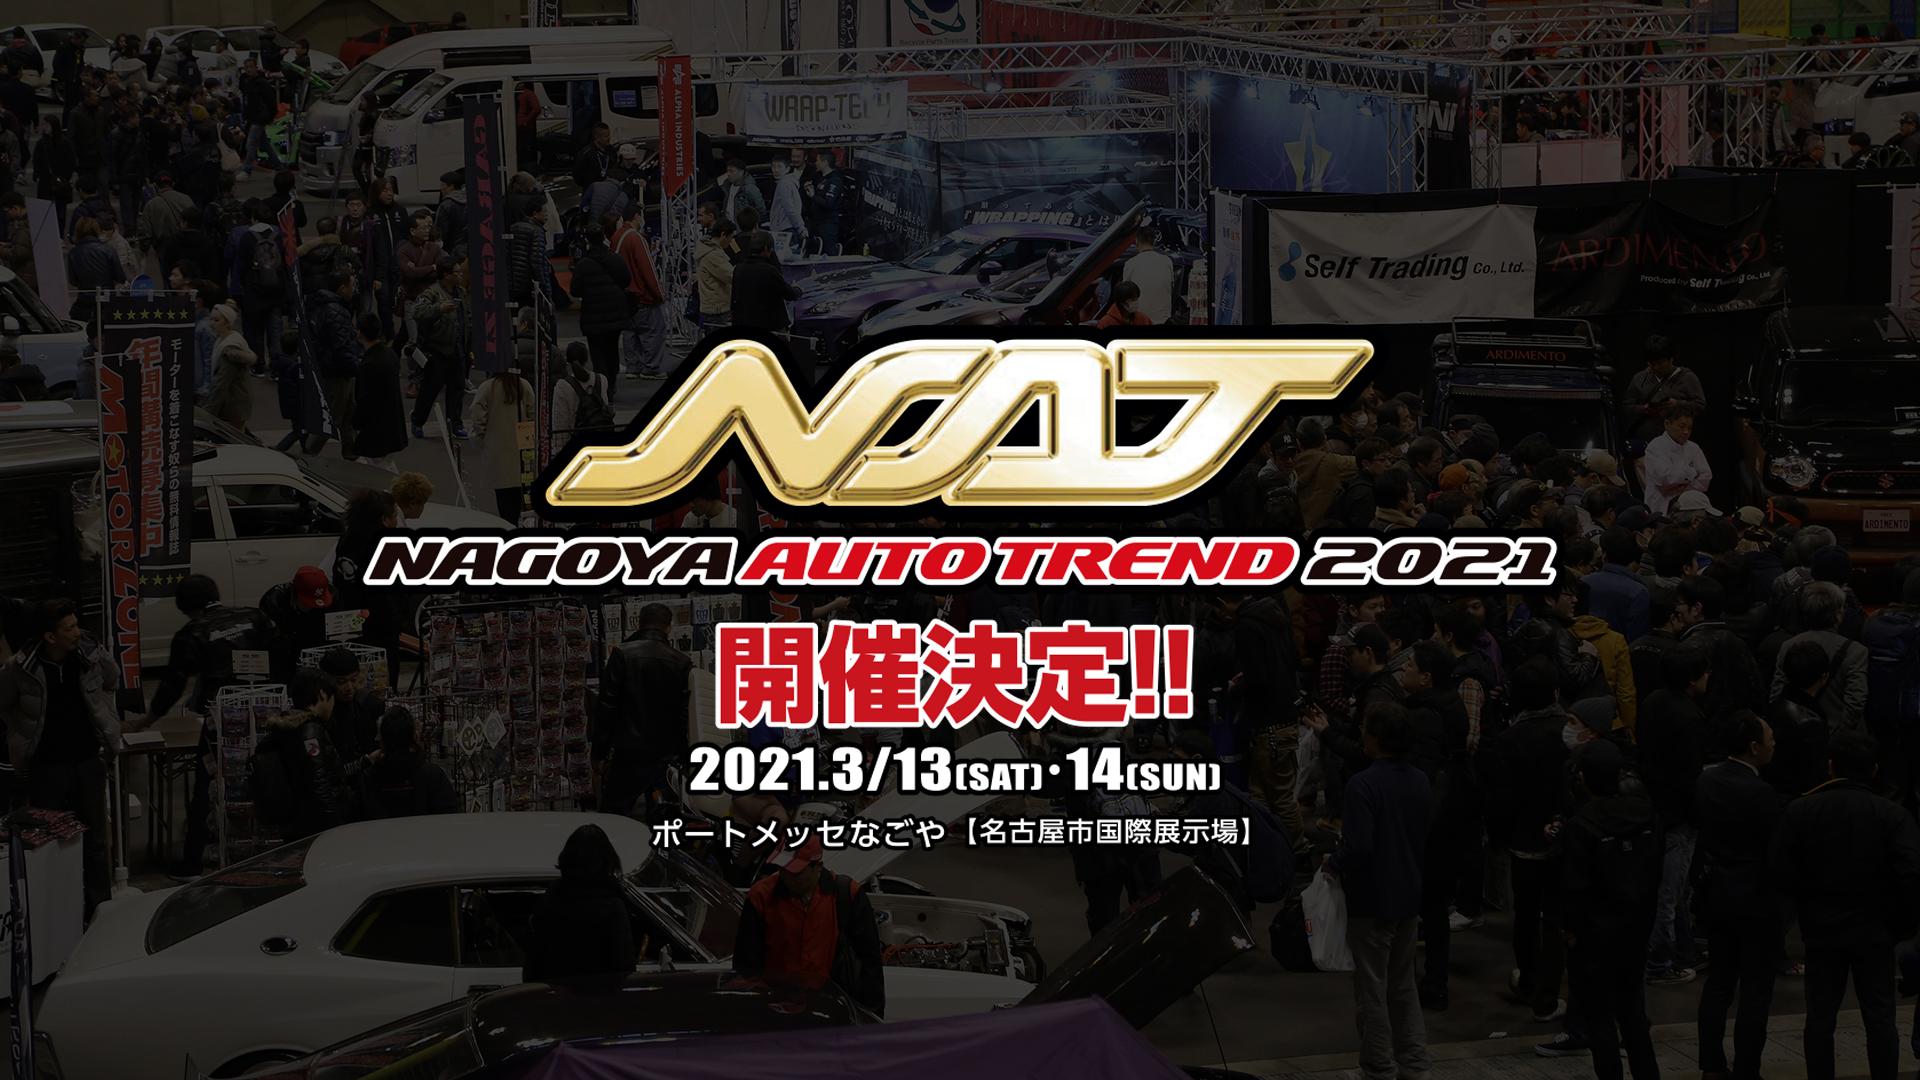 NAGOYAオートトレンド2021(NAGOYA AUTOTREND2021)